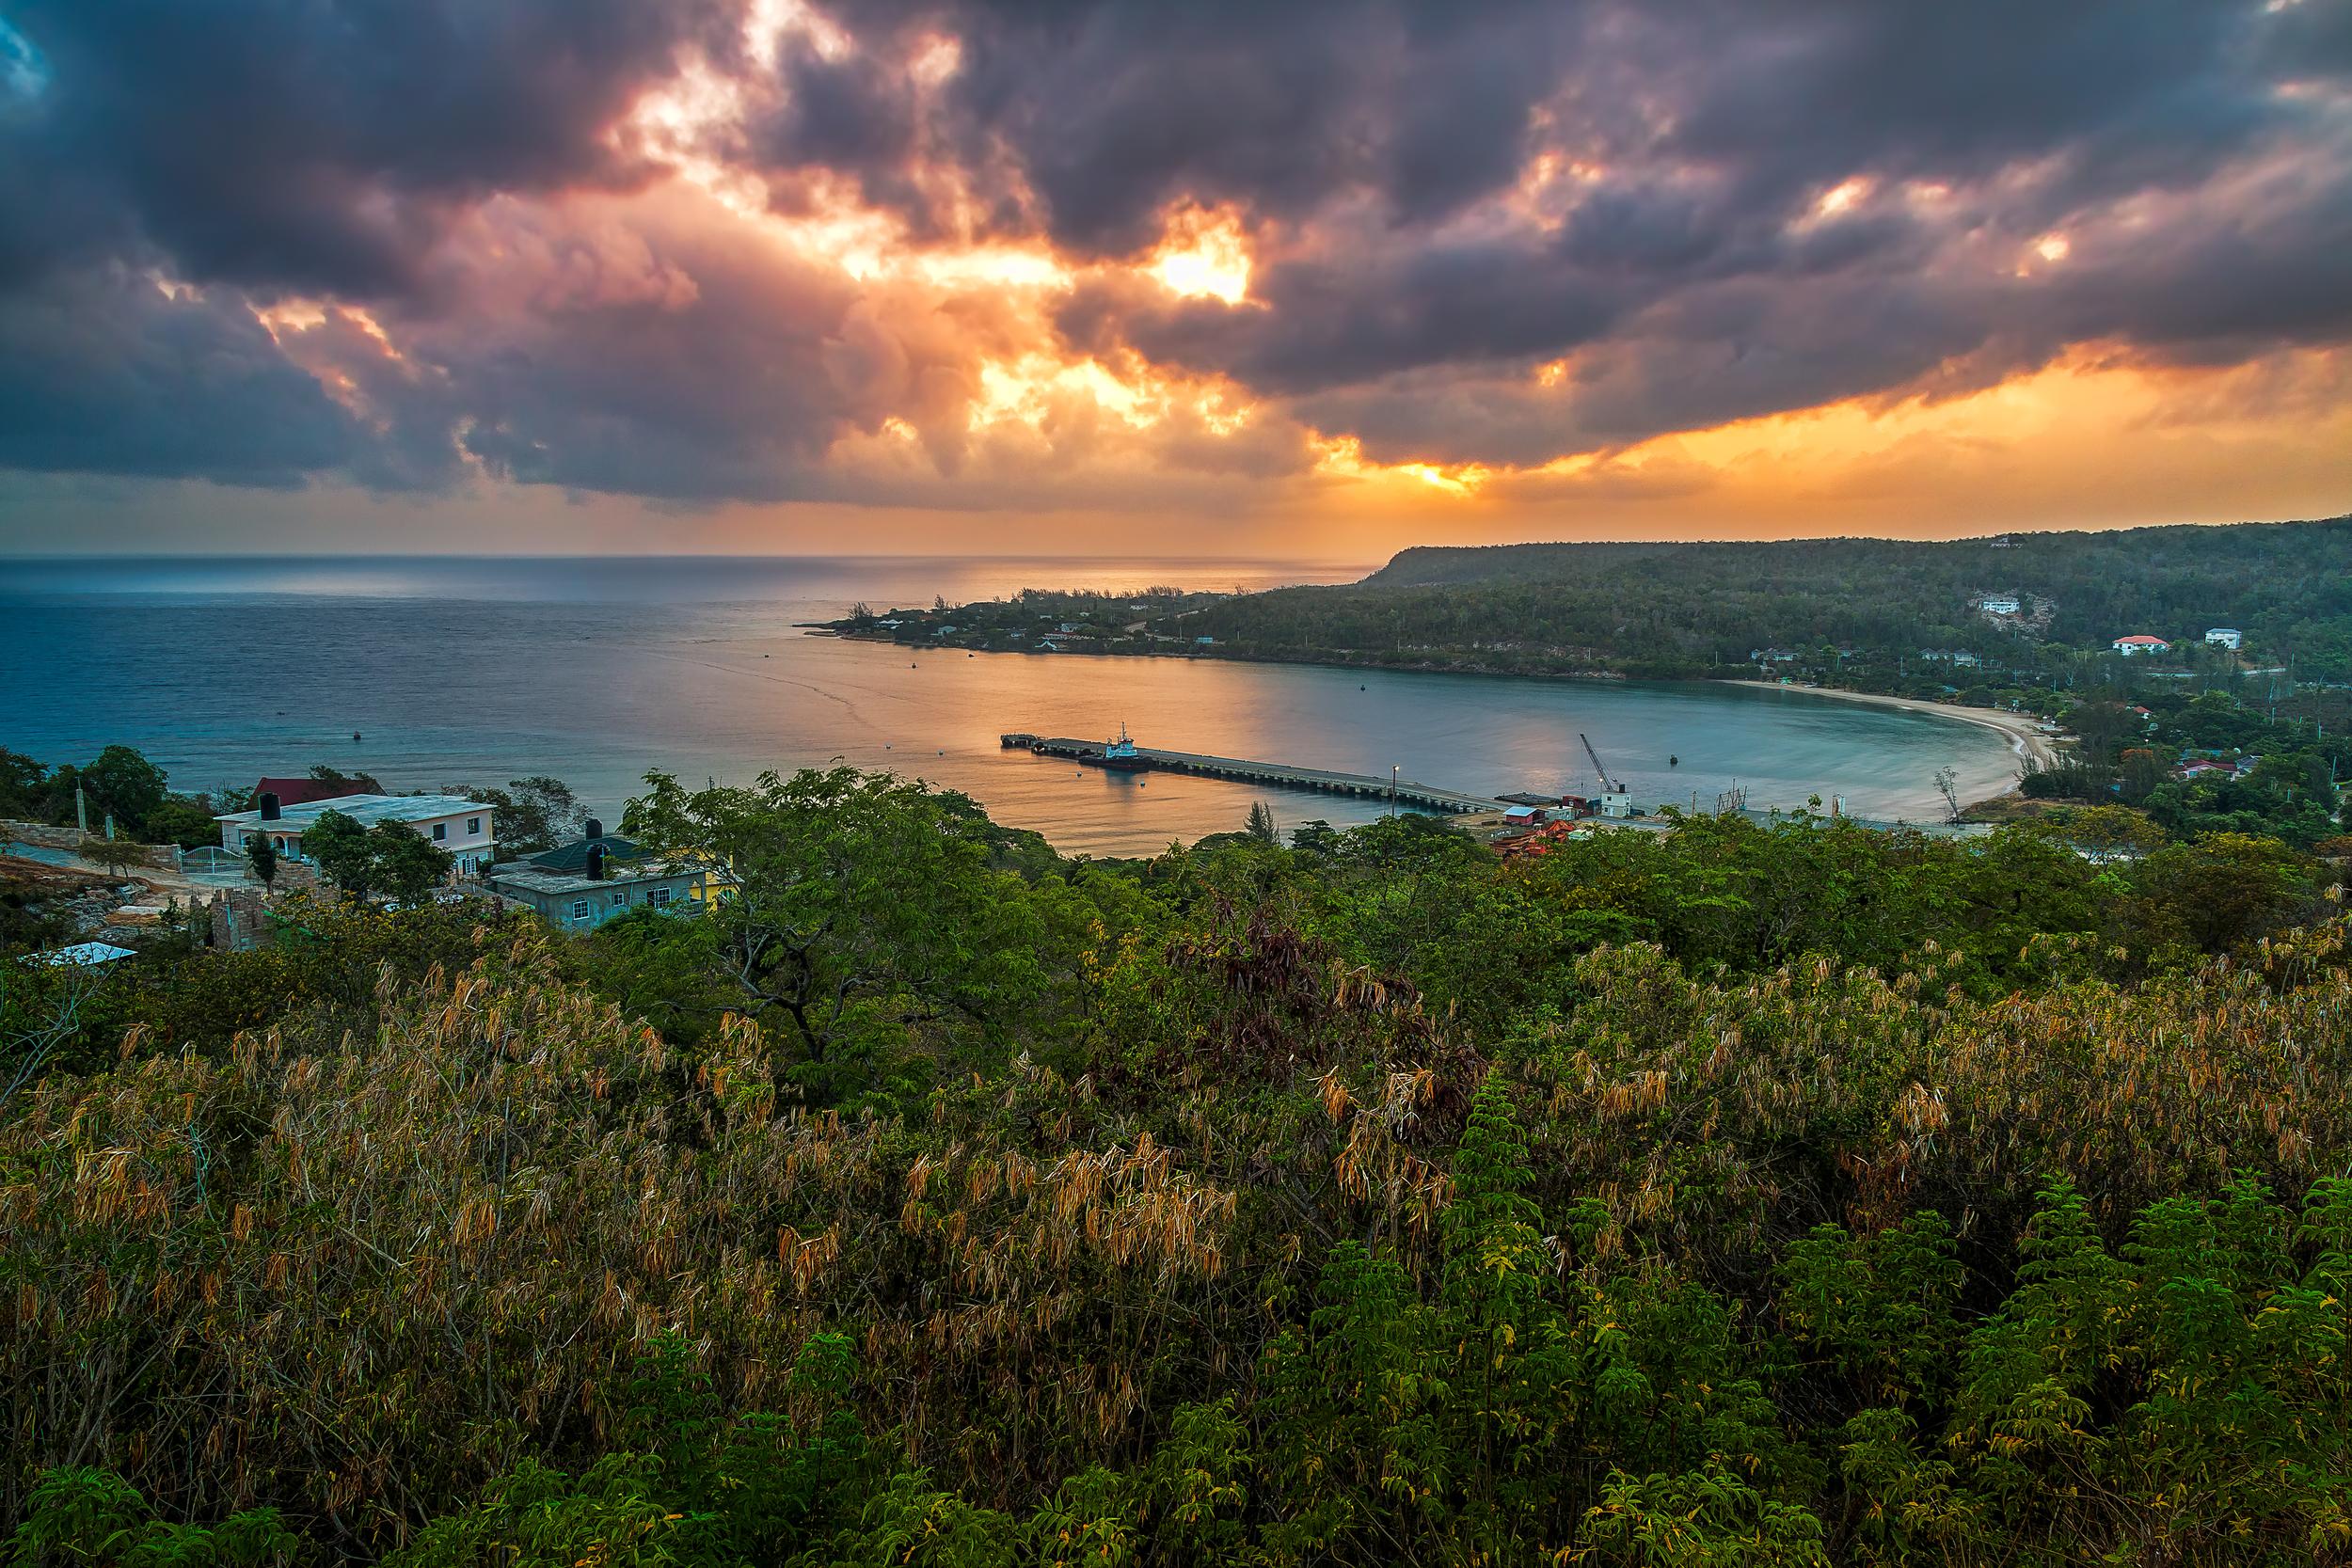 Sunrise view from Rio Bueno in Trelawny, Jamaica